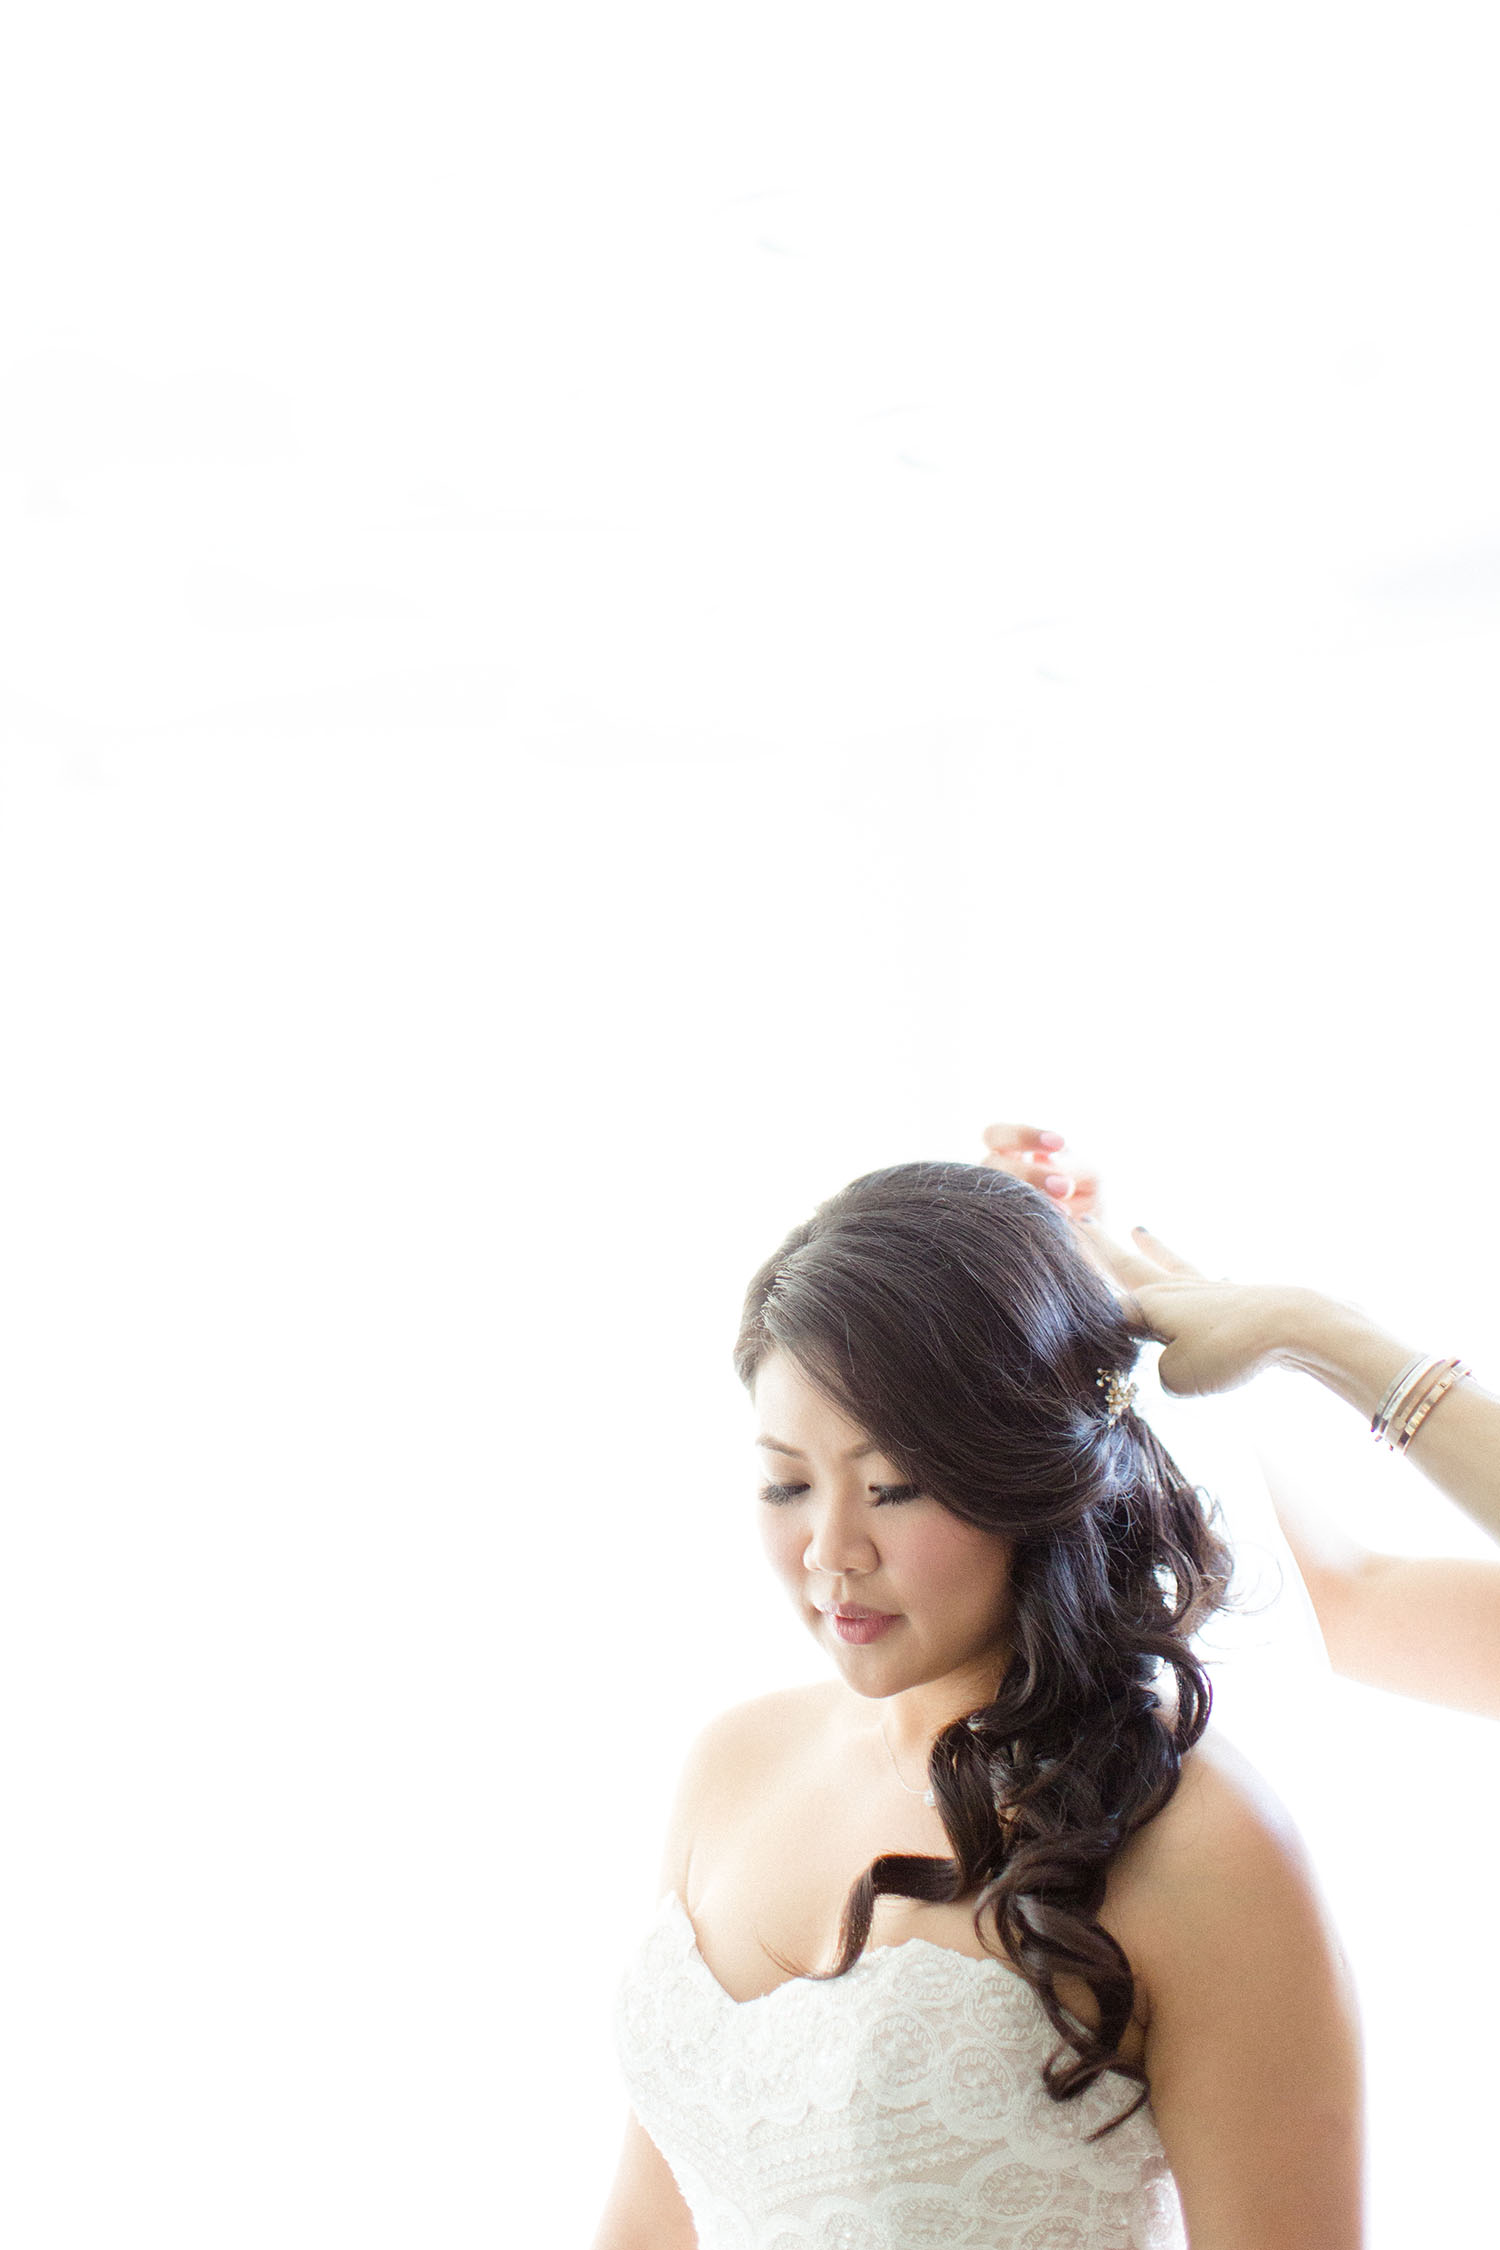 temecula-wedding-photographer009s2.jpg